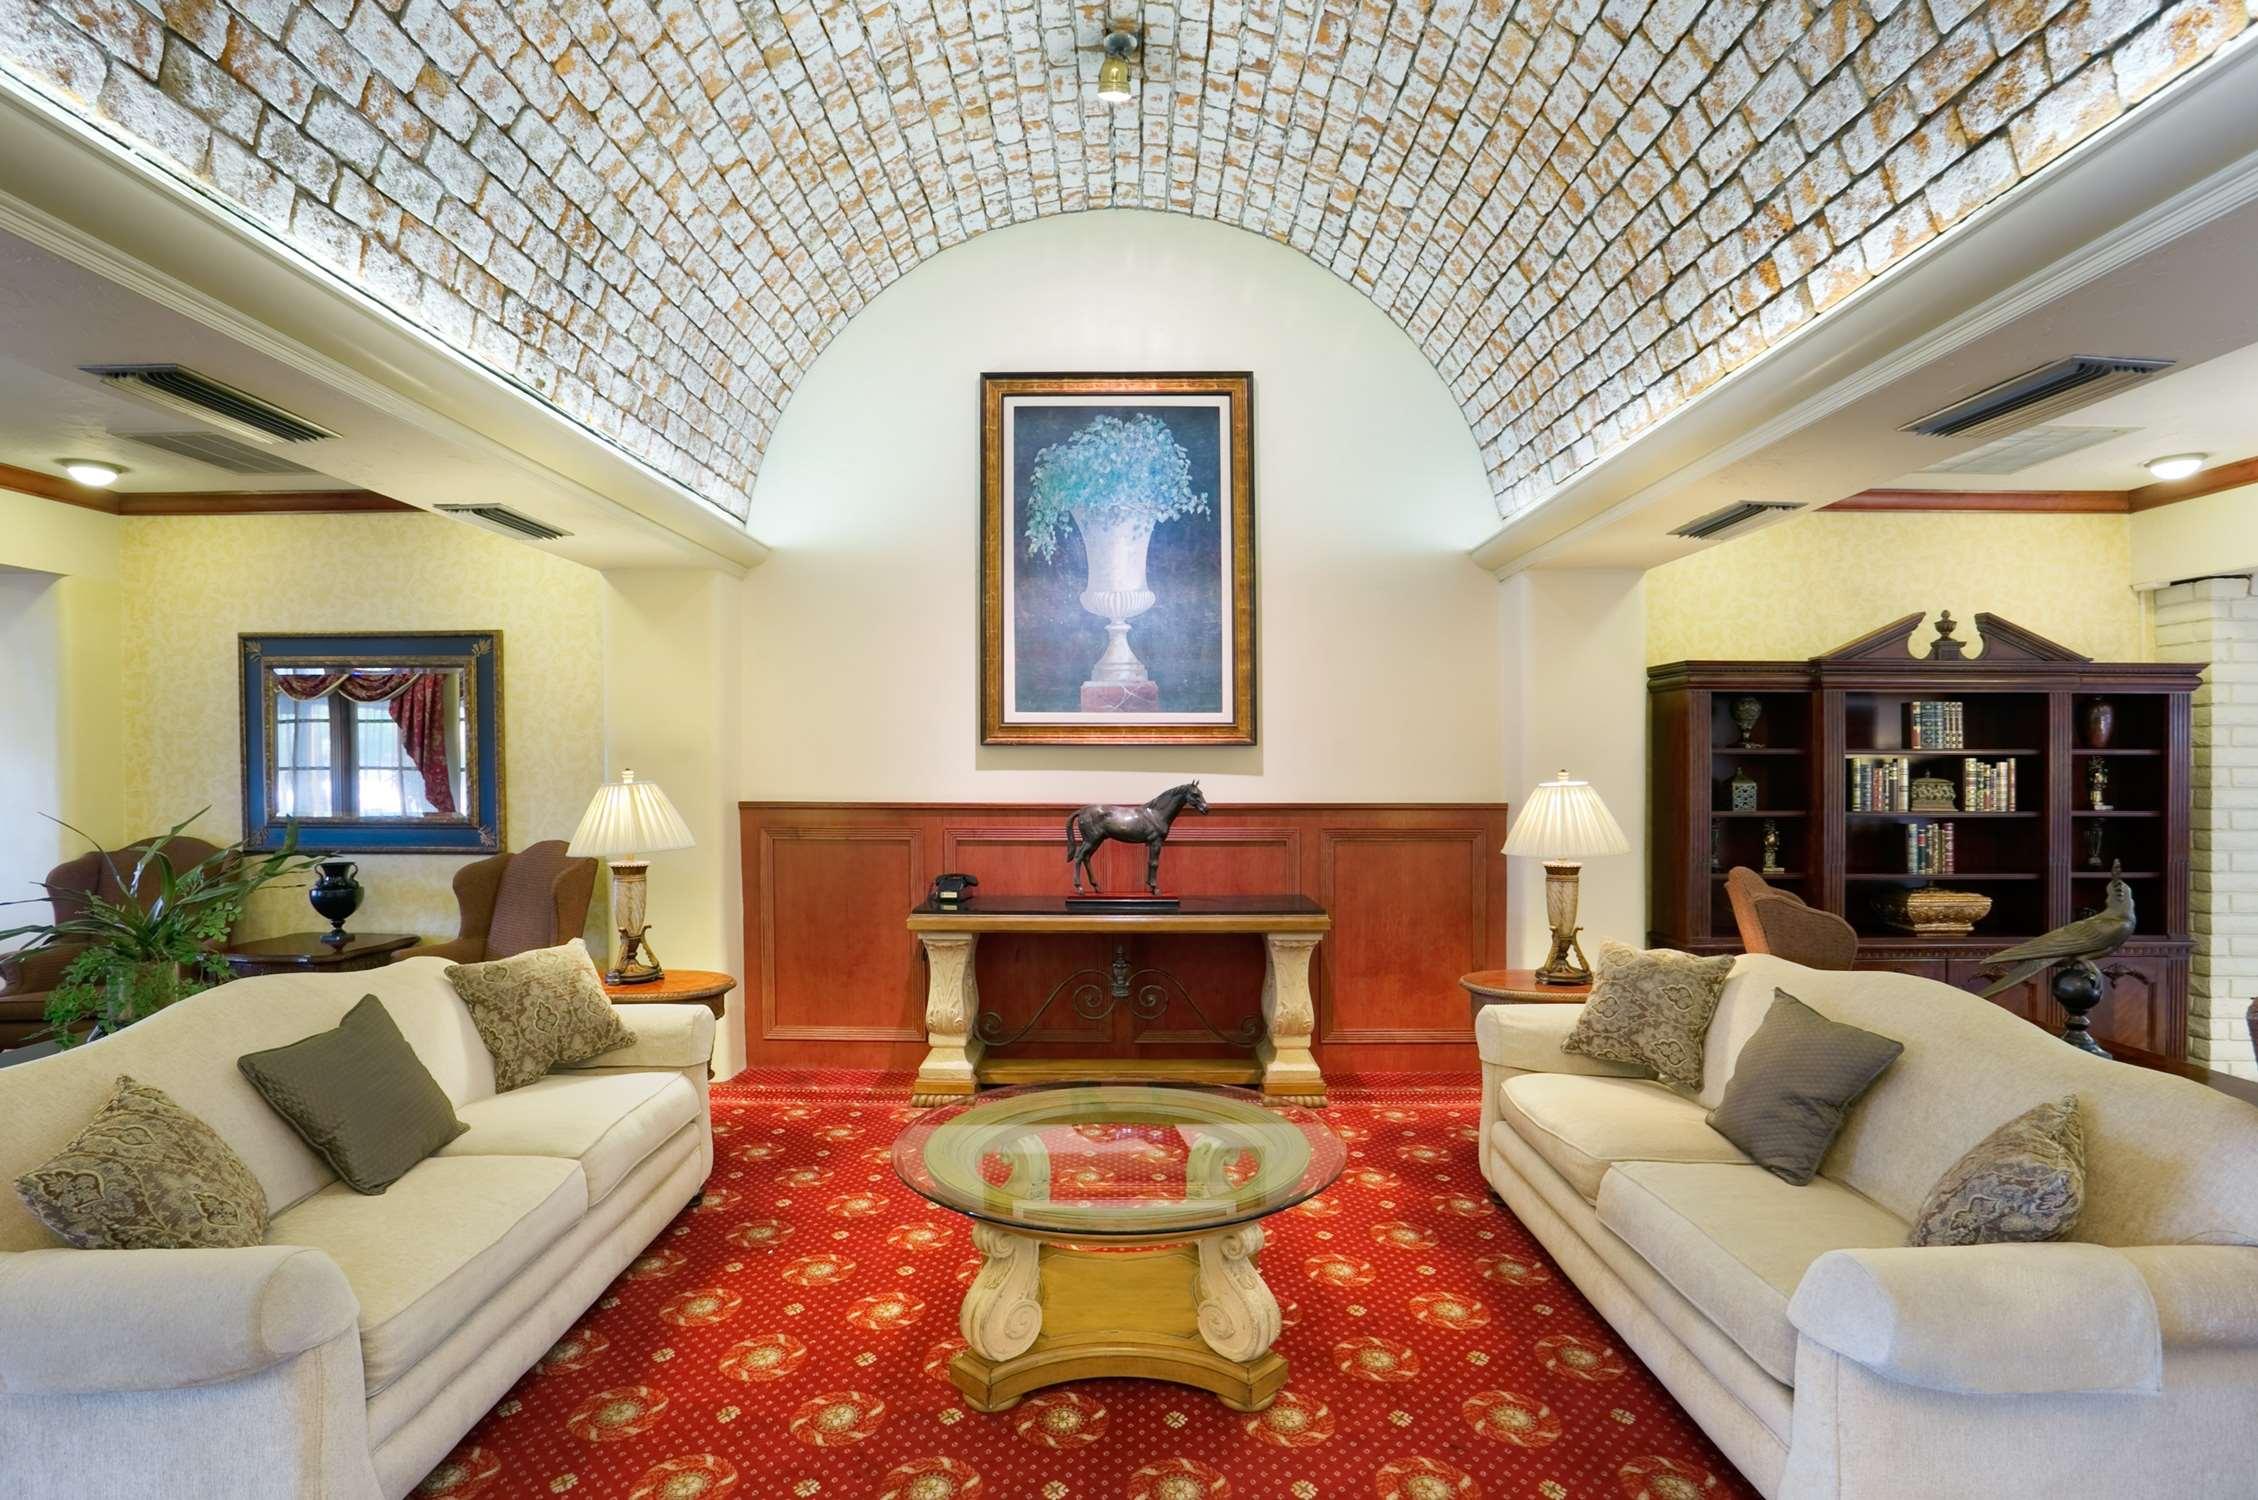 Embassy Suites by Hilton Arcadia Pasadena Area image 8